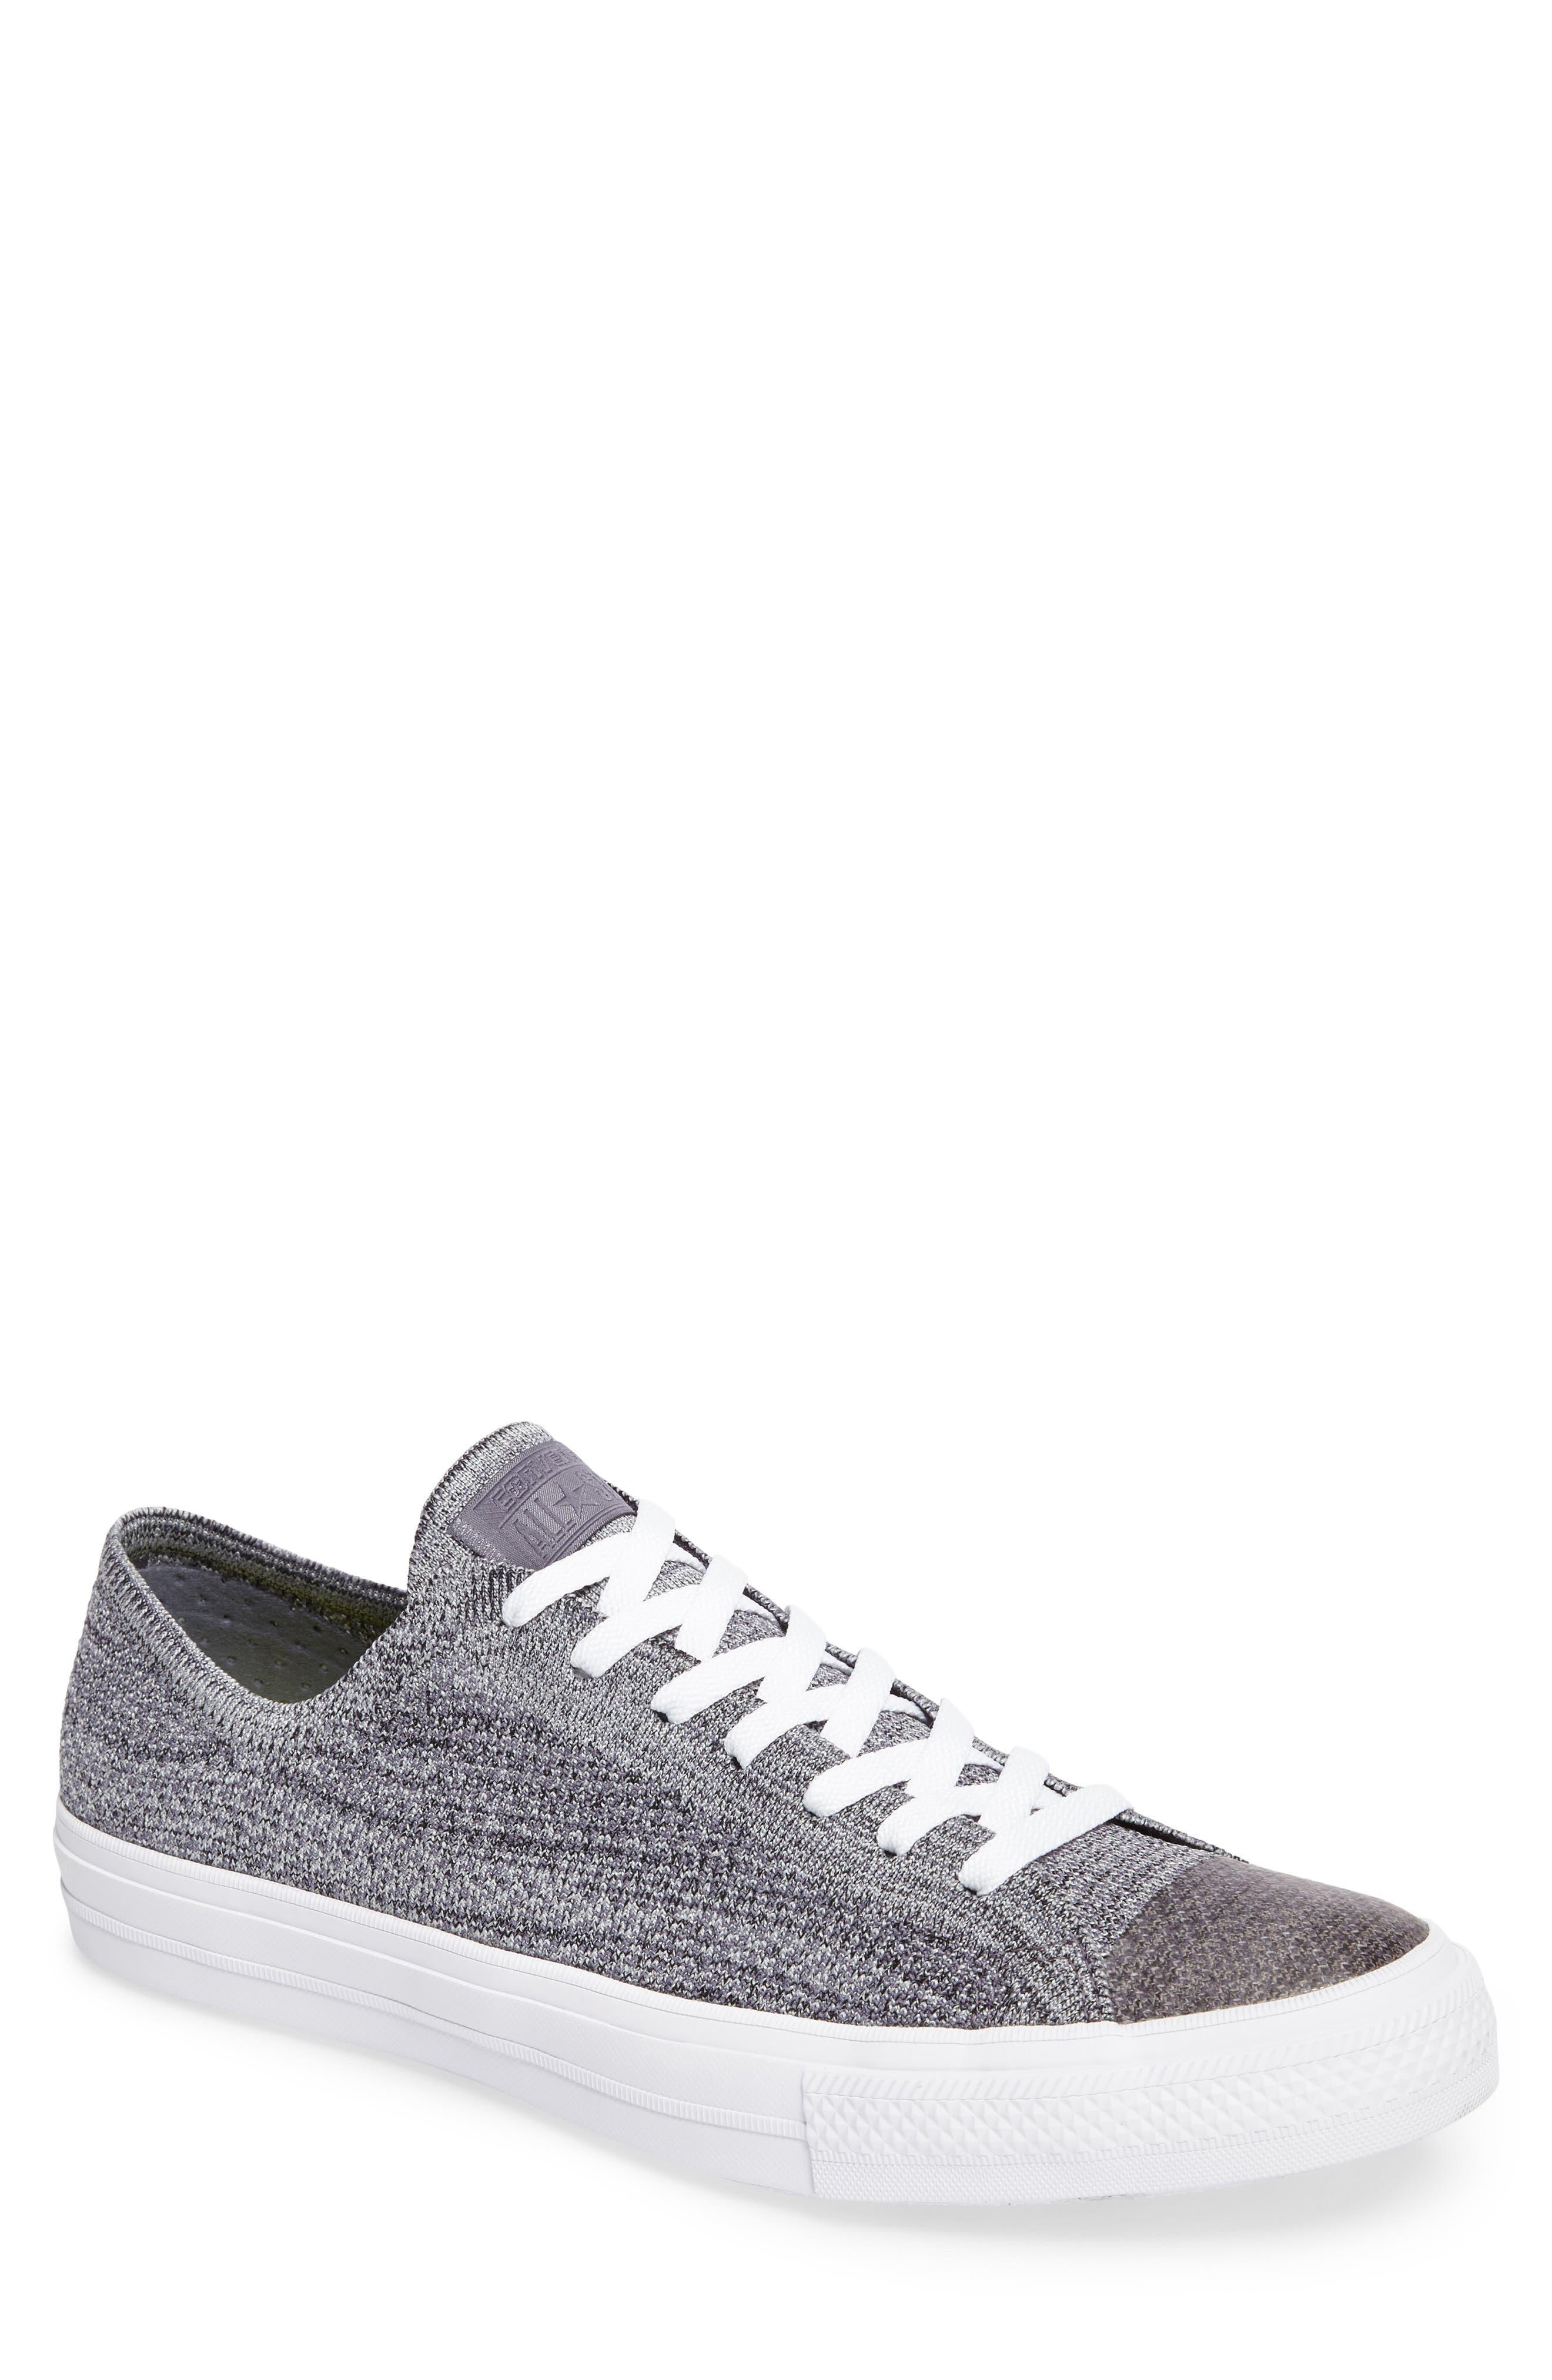 Main Image - Converse Chuck Taylor® All Star® Flyknit Sneaker (Men)